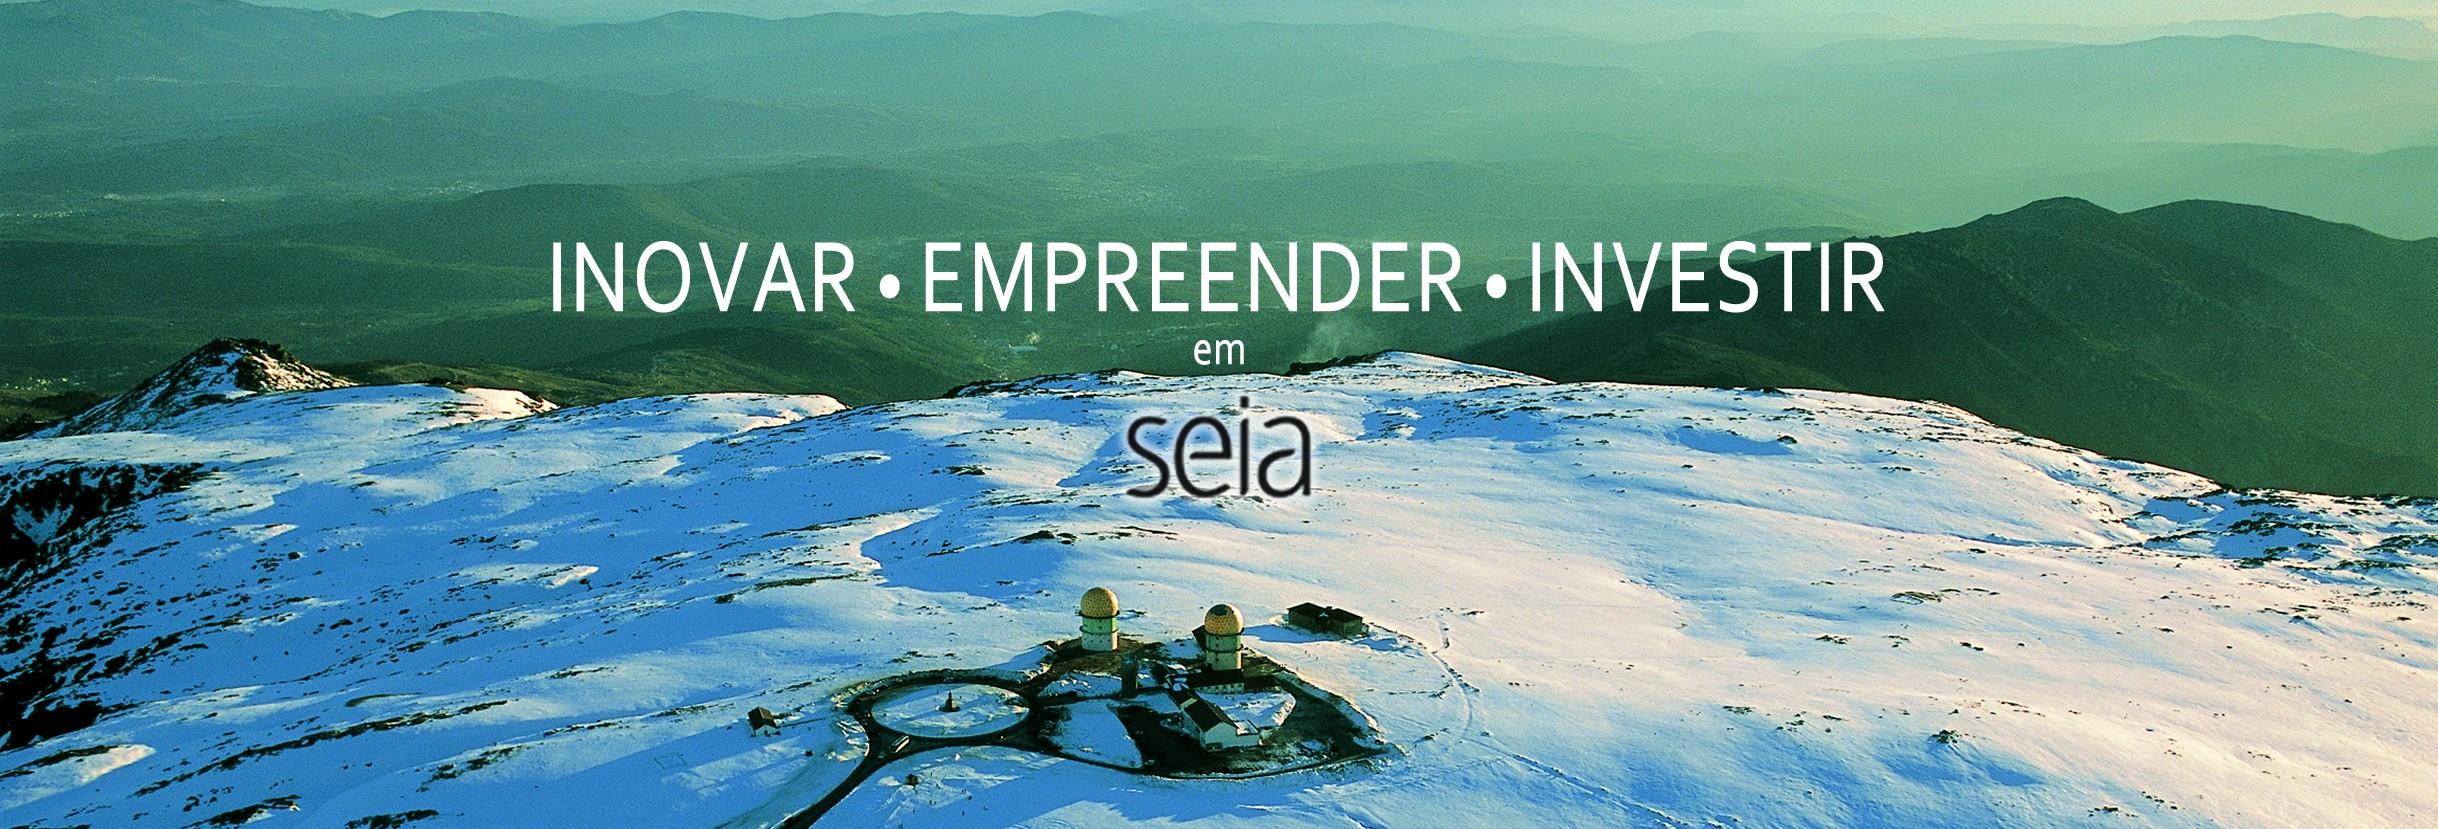 inovar-empreender-investir